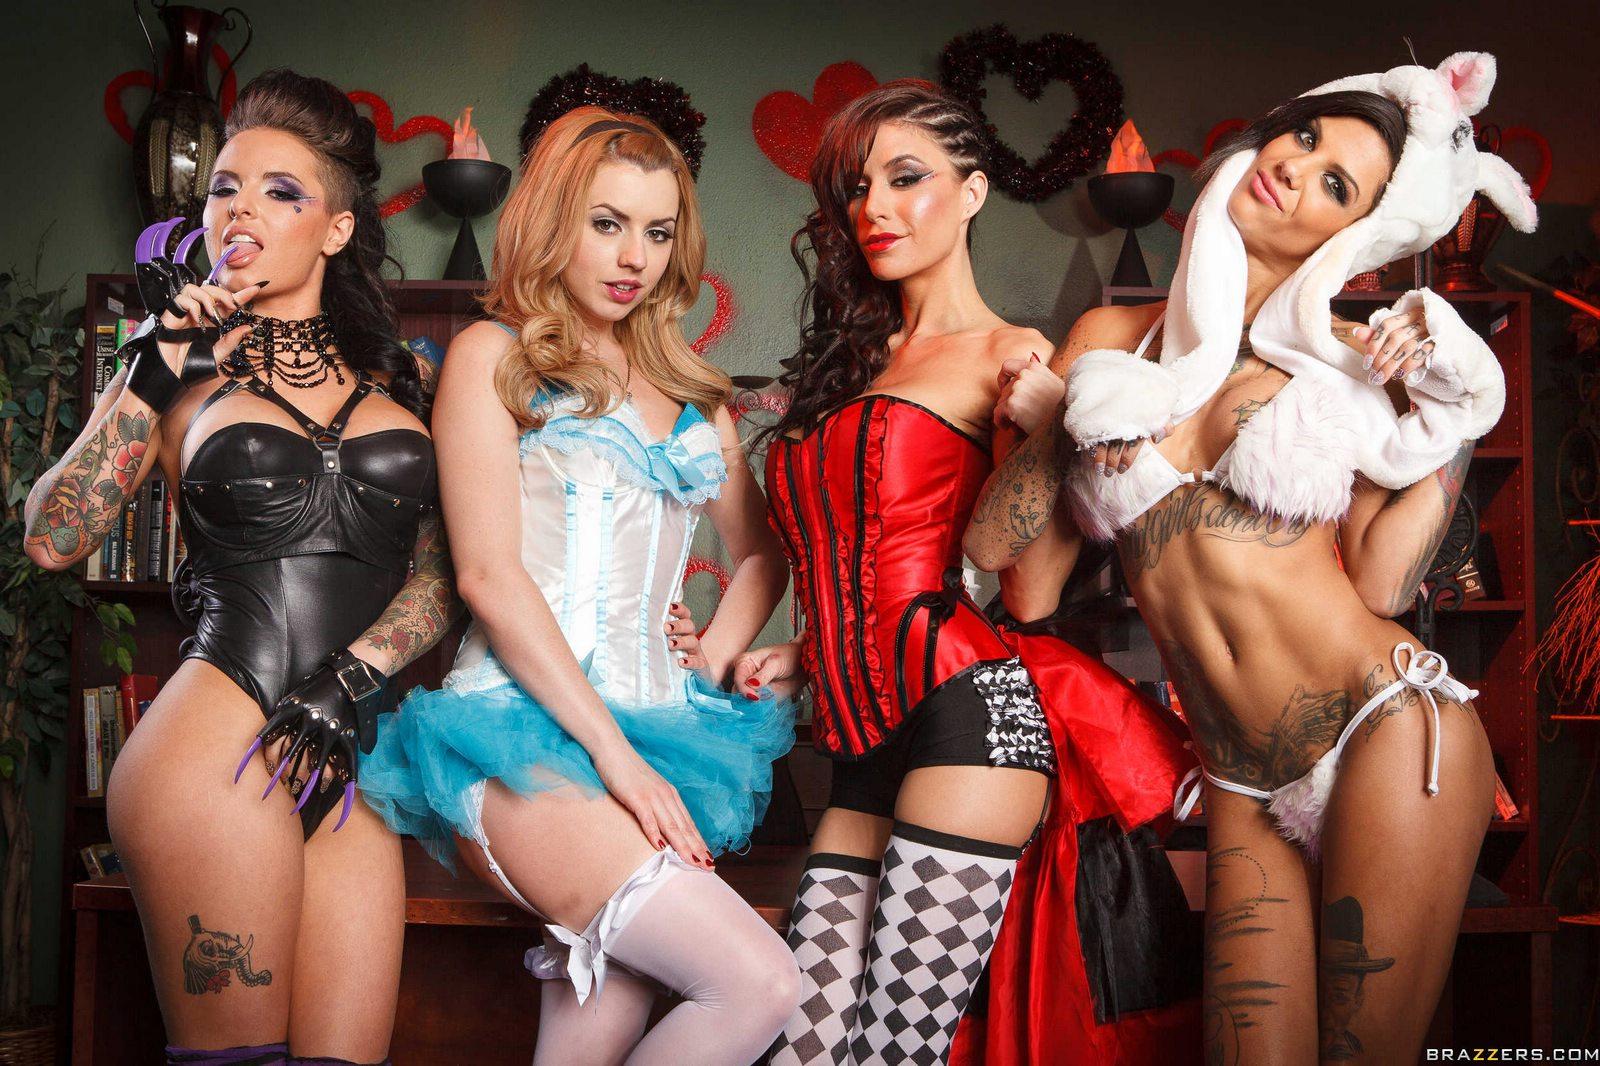 Christy Mack Lexi Belle - Best Porn Photos, Hot XXX Images ...